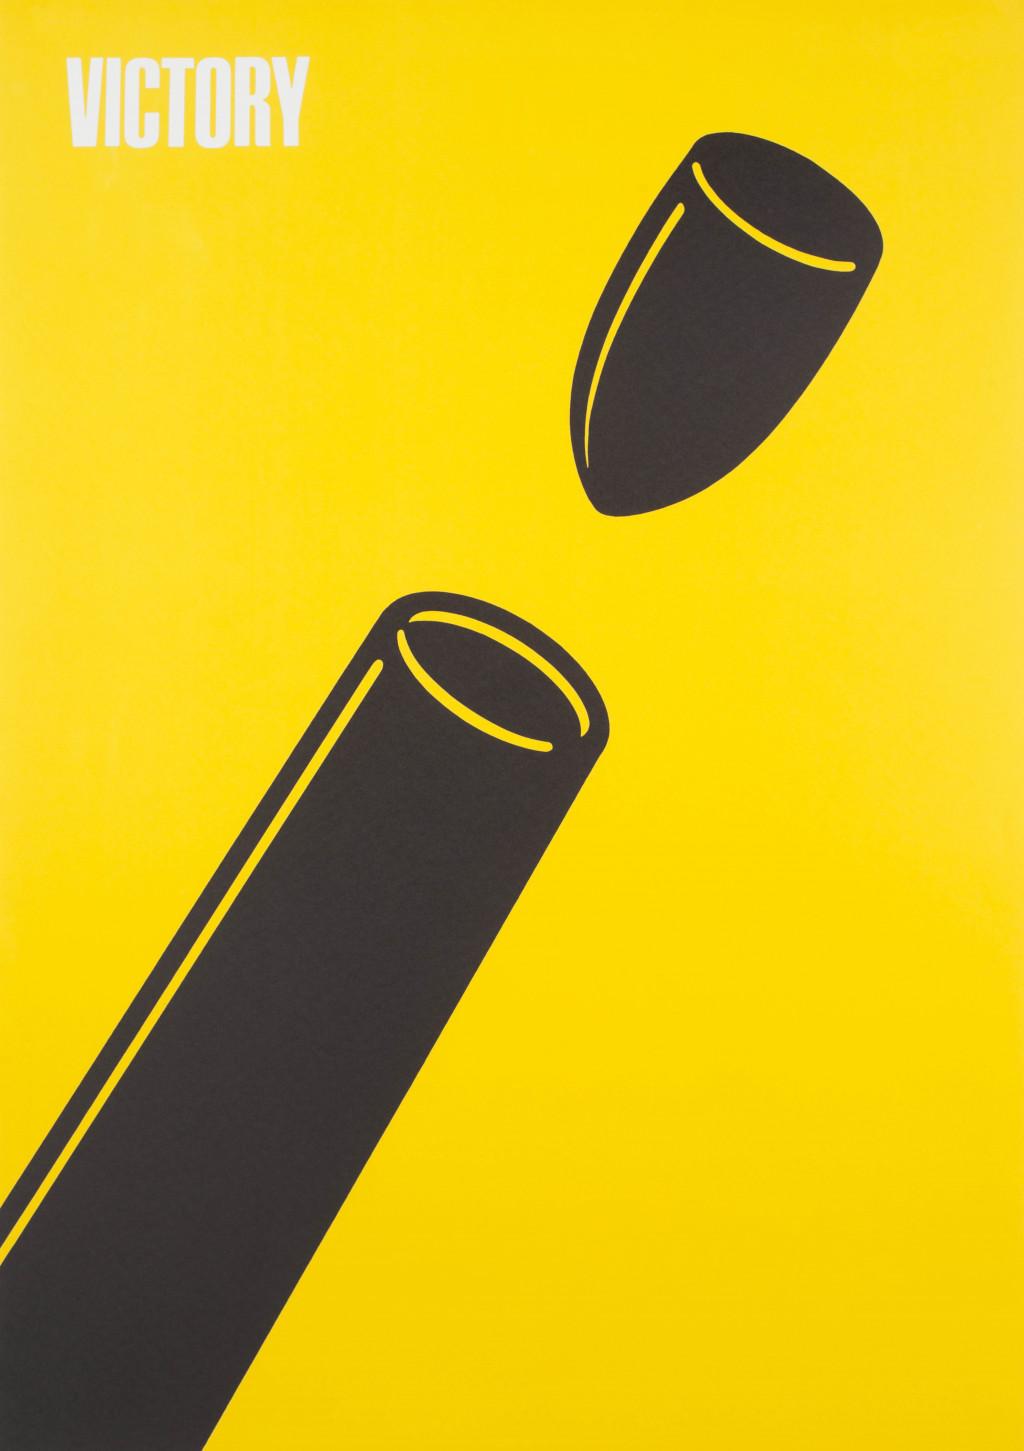 Shigeo Fukuda, 'Victory 1945', 1976. Collection Stedelijk Museum Amsterdam